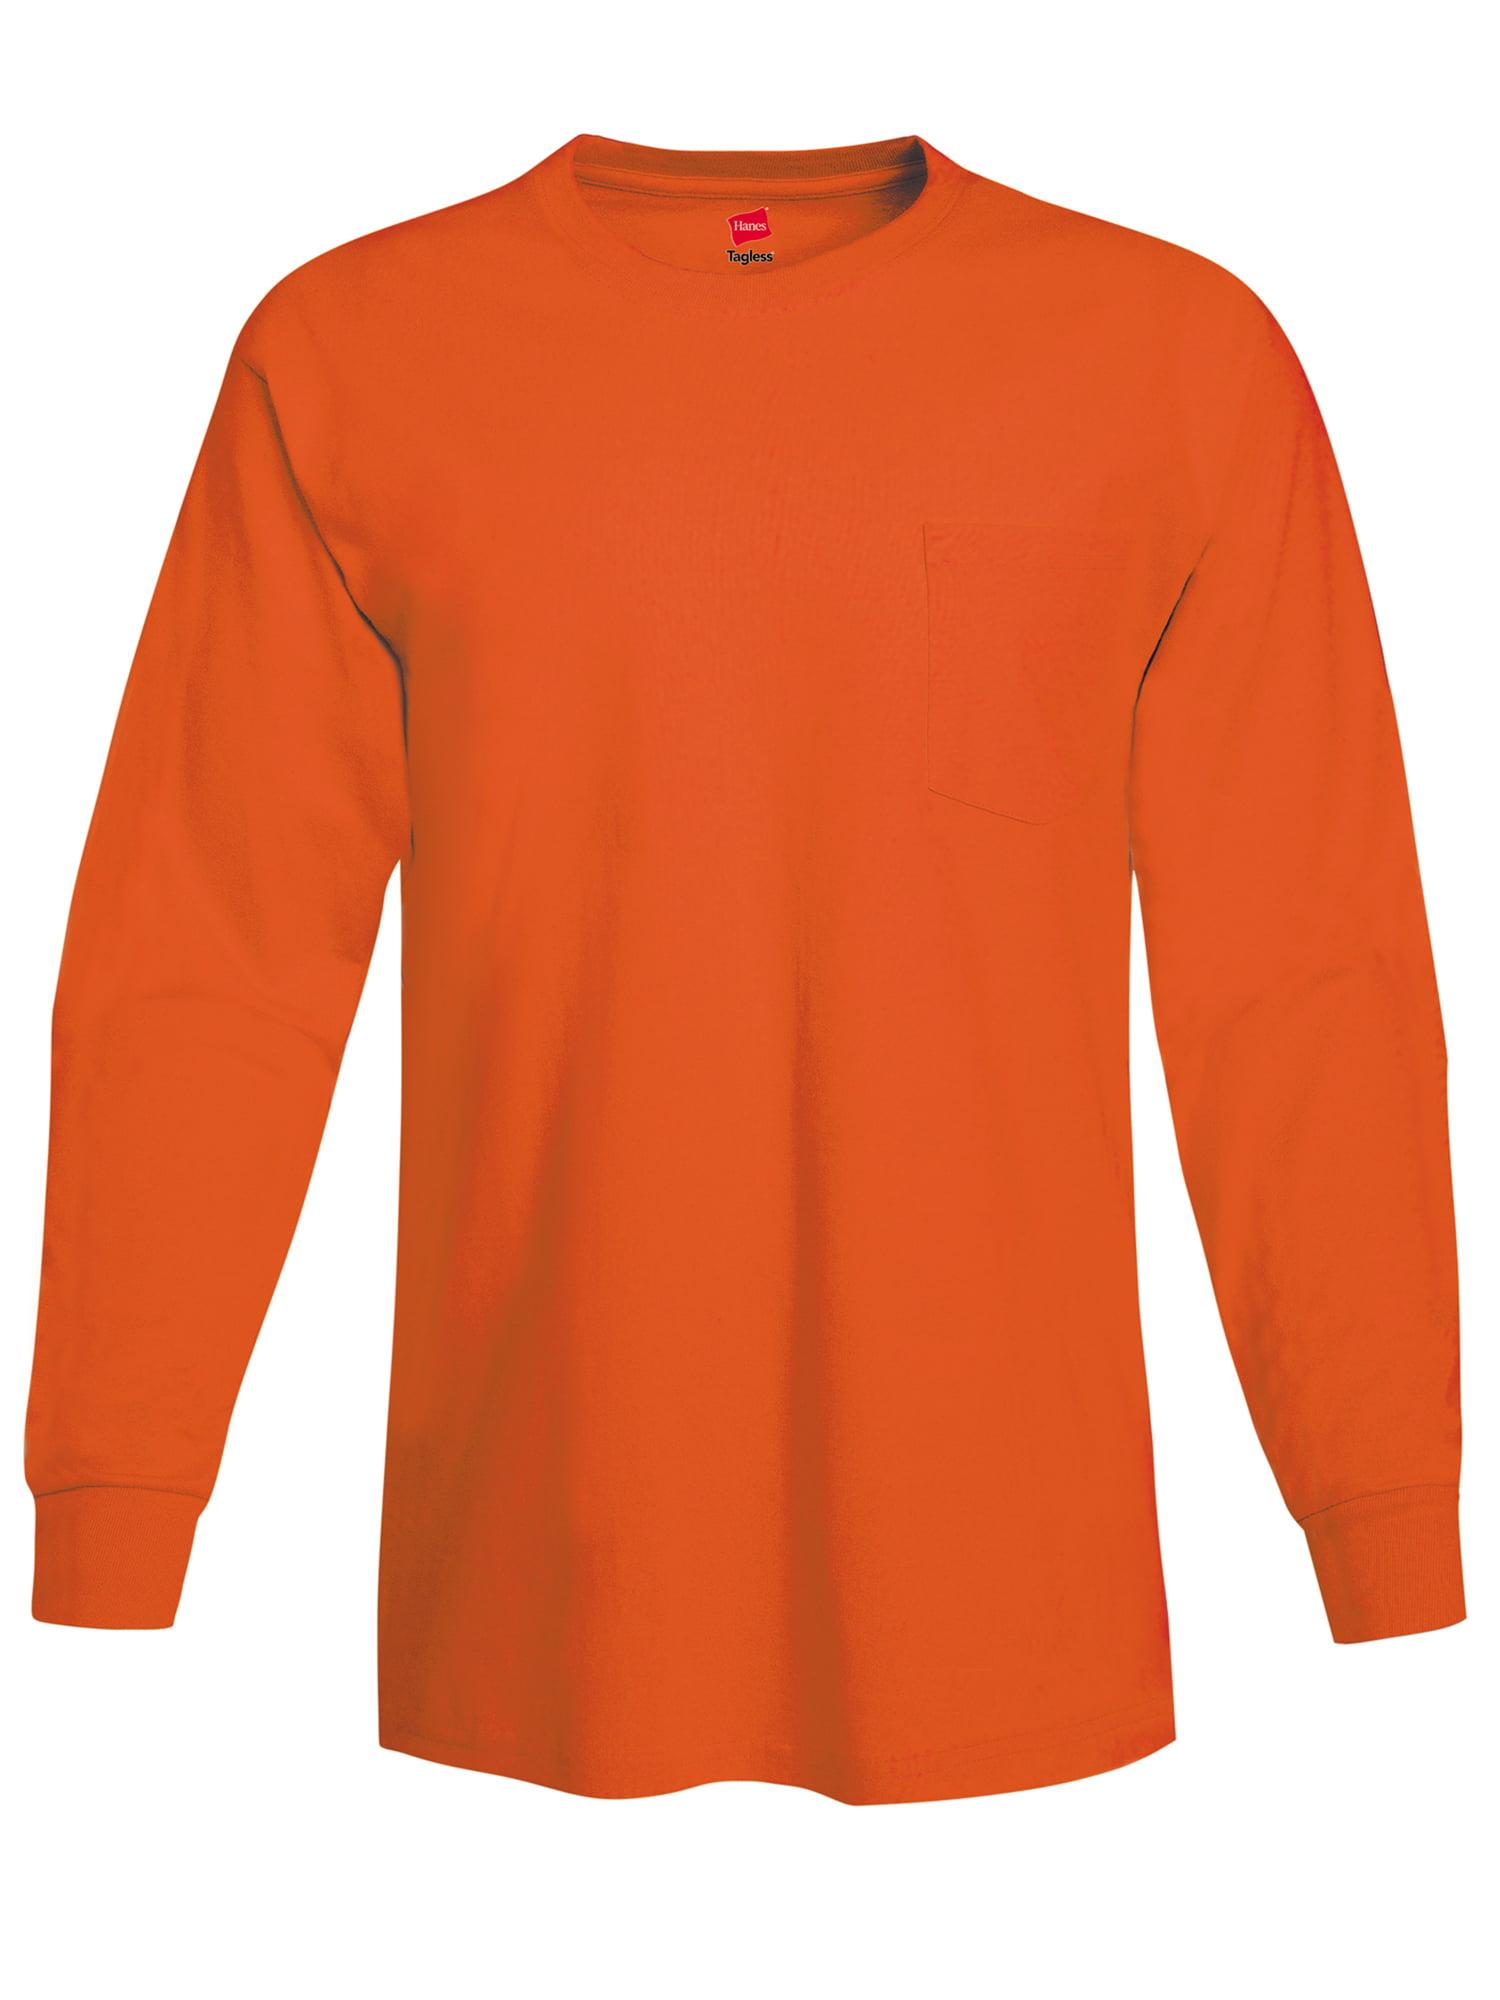 Hanes - Hanes Men s Tagless Cotton Long Sleeve Pocket Tshirt - Walmart.com 5bfa708f74e2